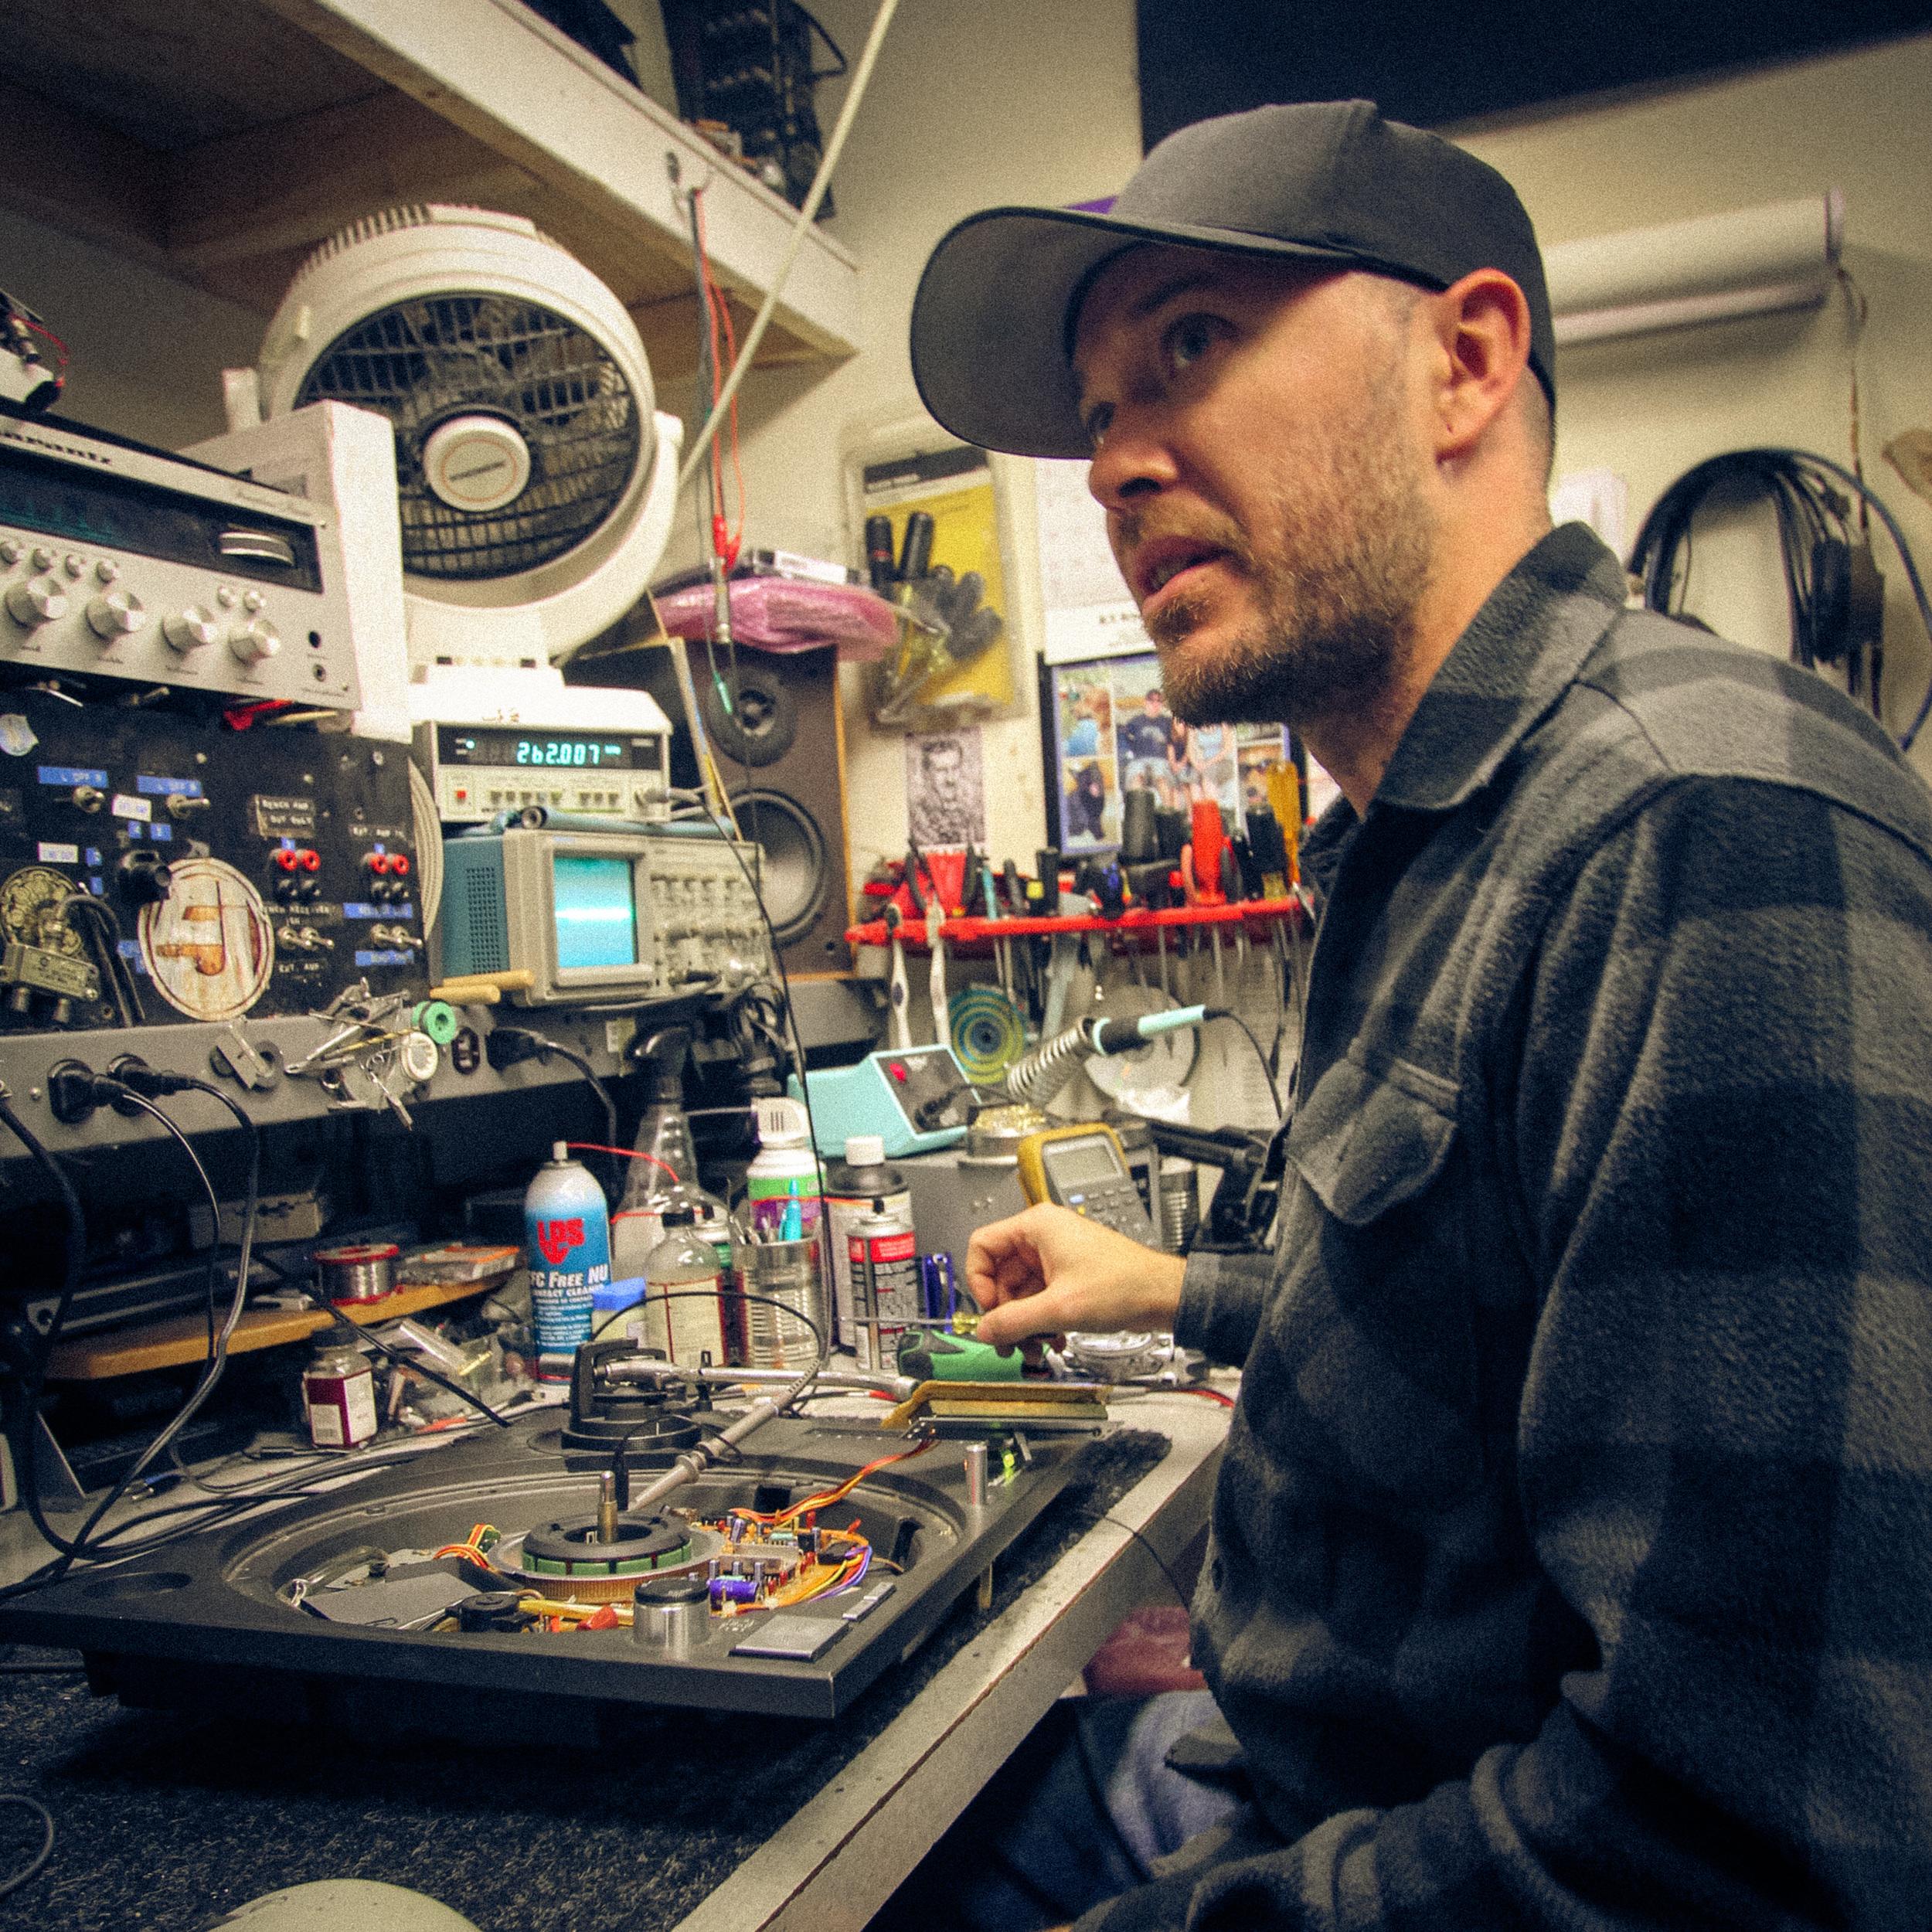 Jim, Technician